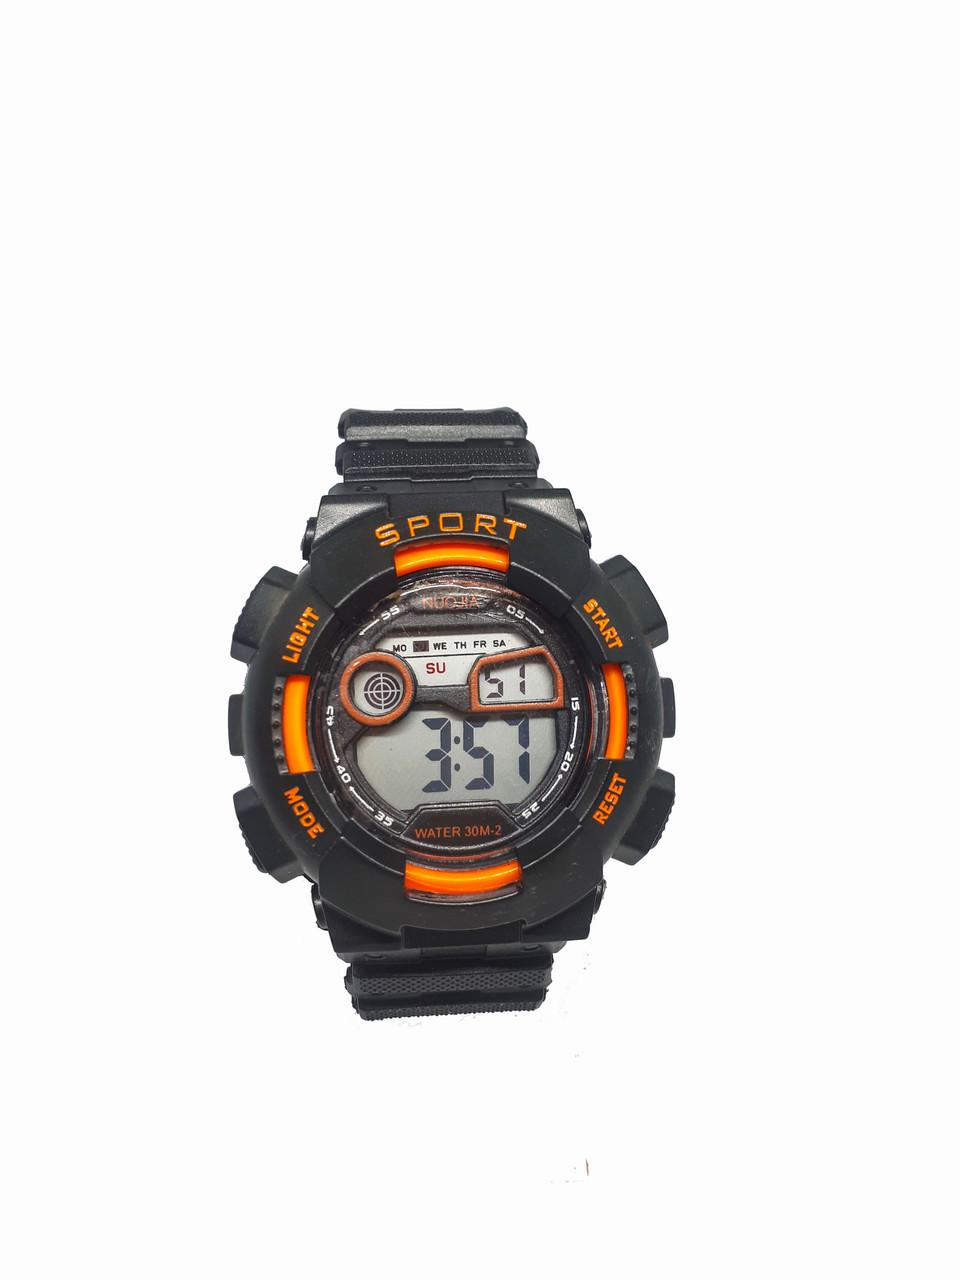 Часы Nuojia электронные водонепроницаемые. Оранжевый